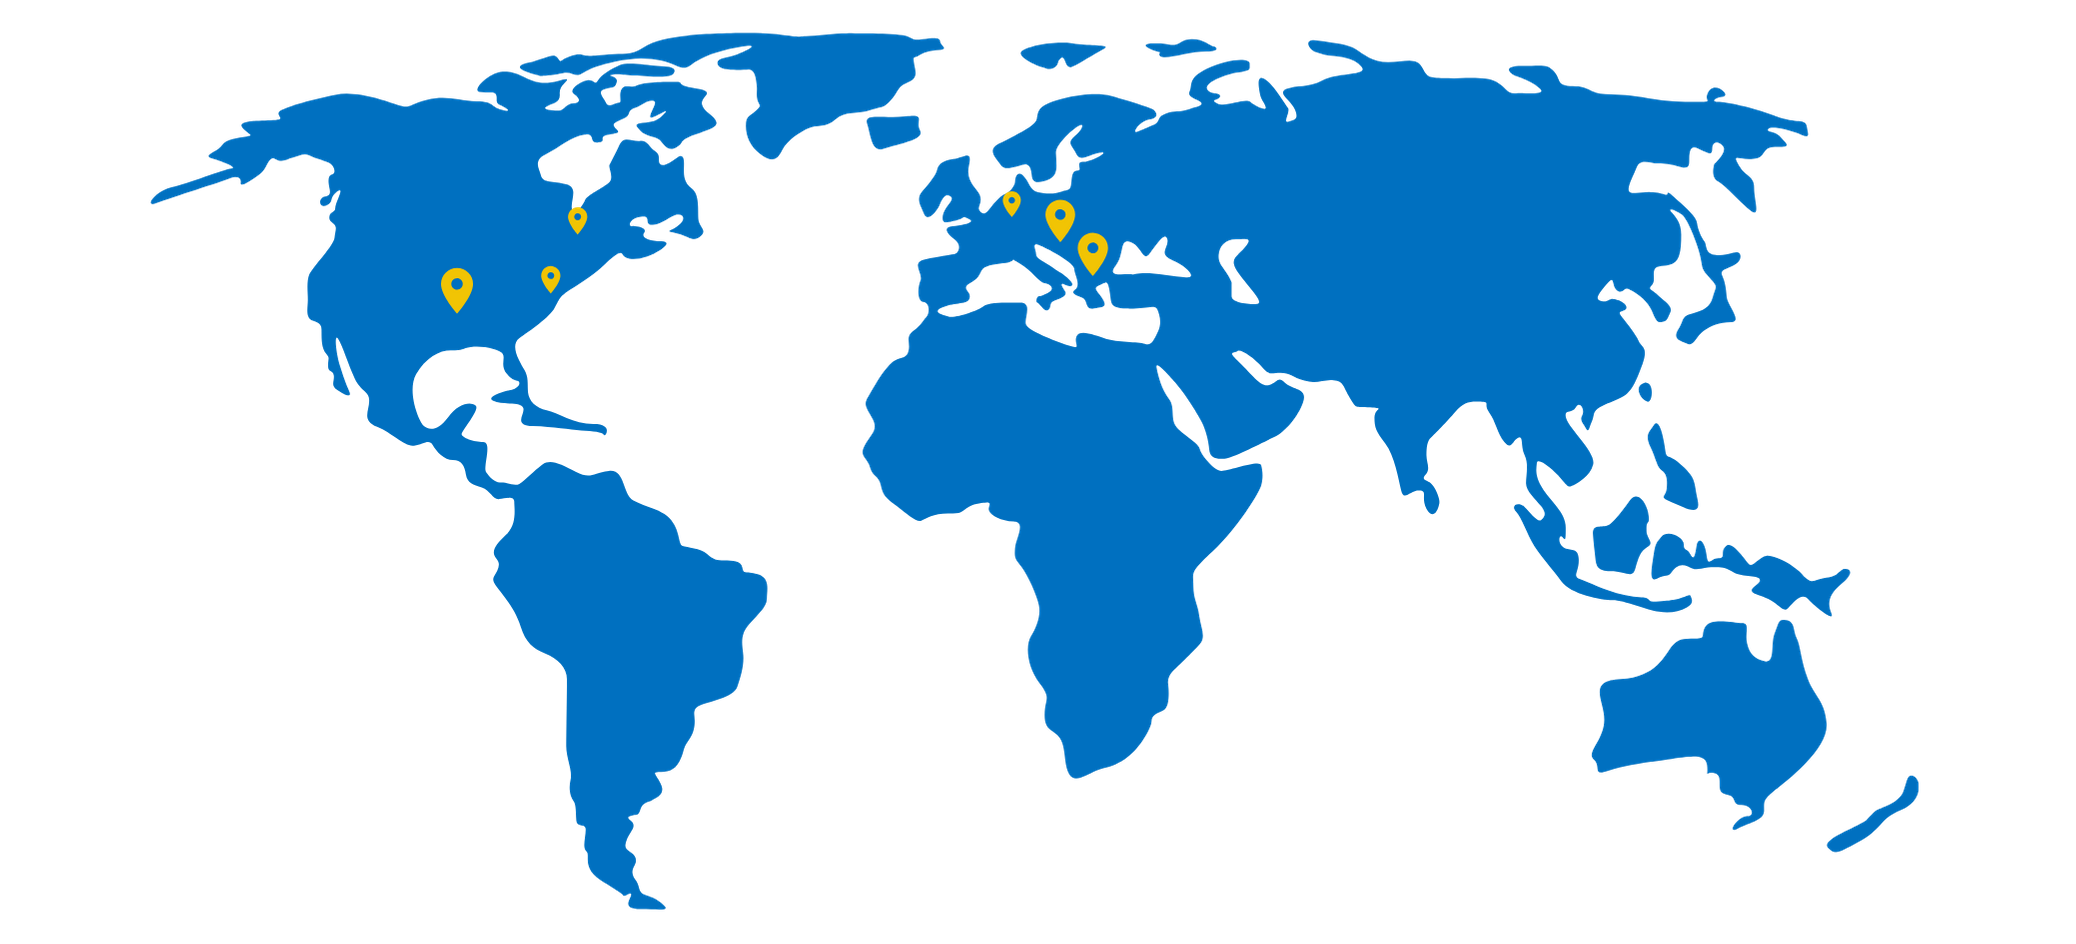 Semos map